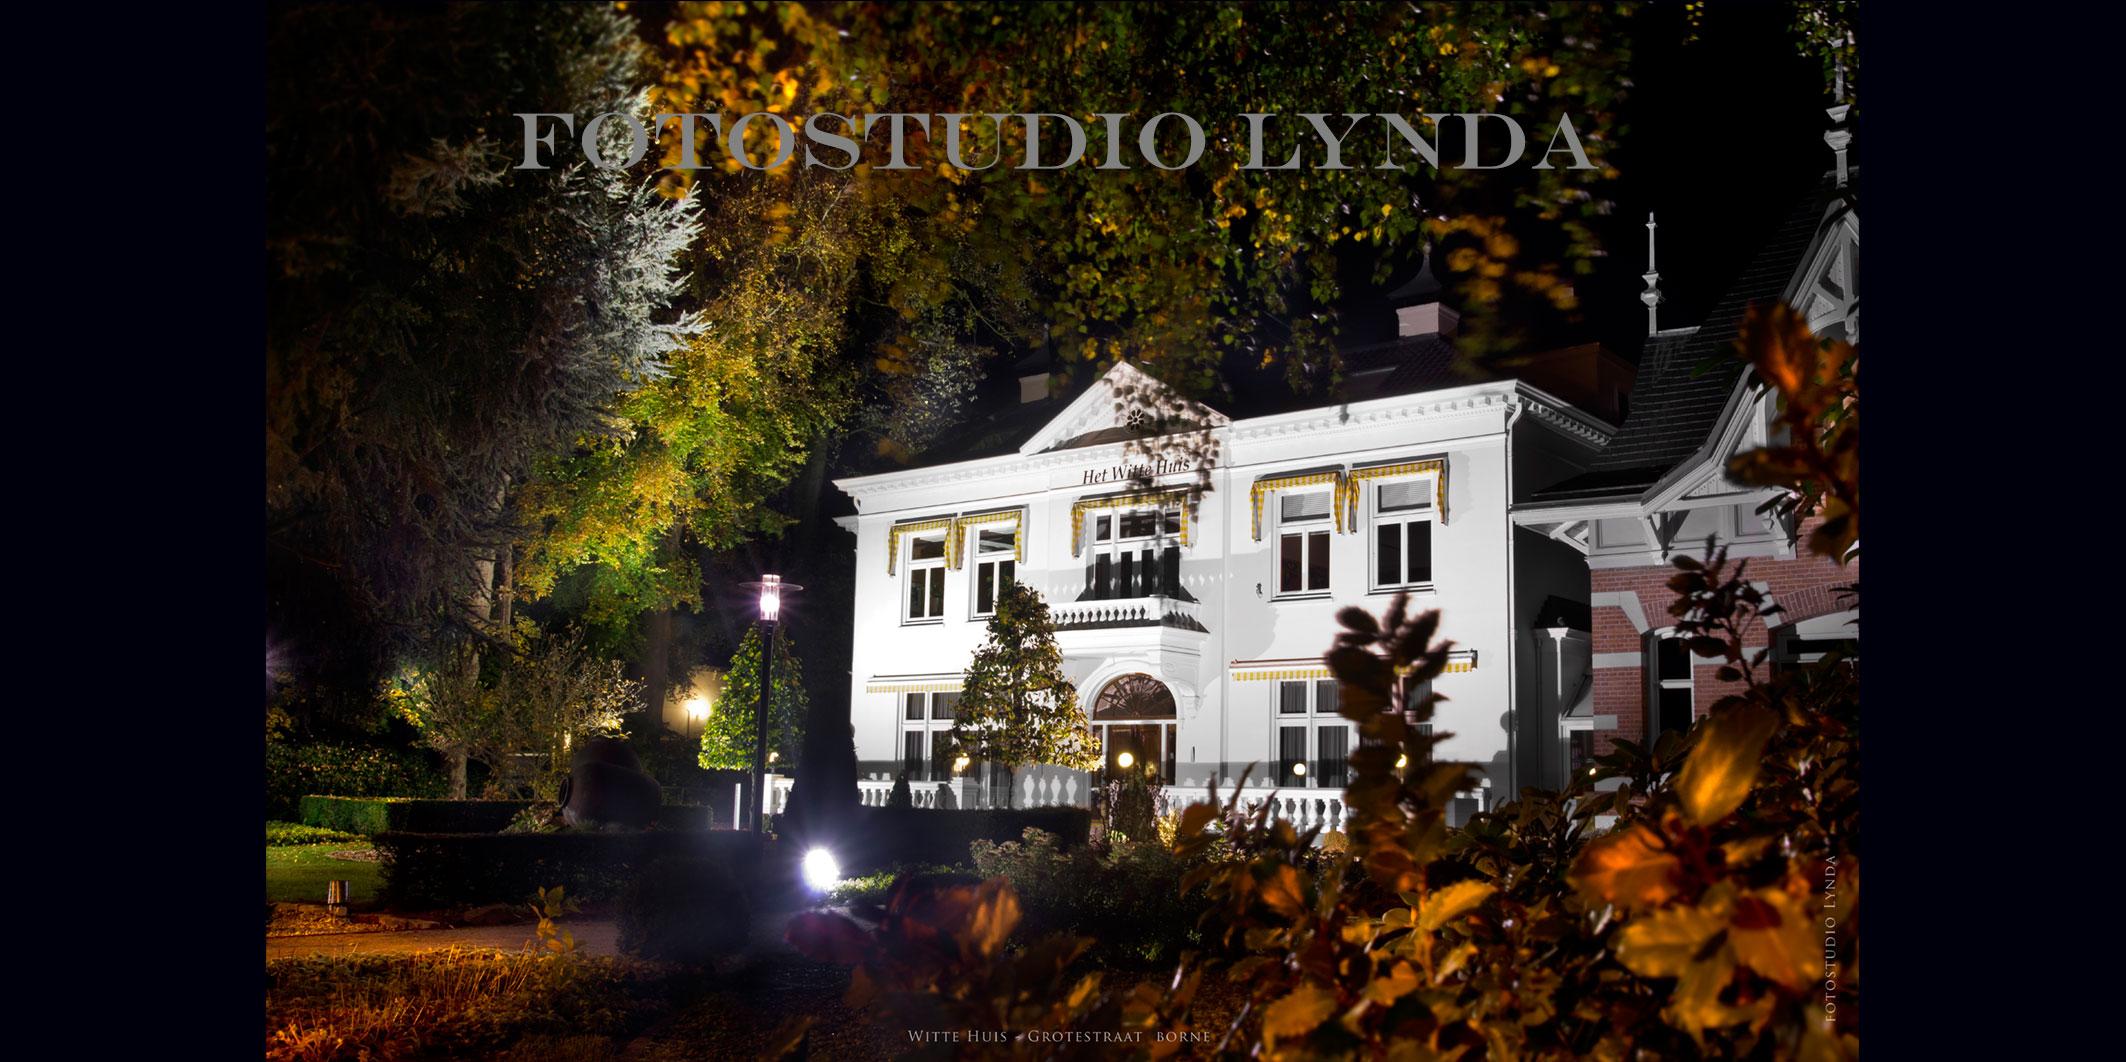 #FotostudioLynda #Borne #Overijssel